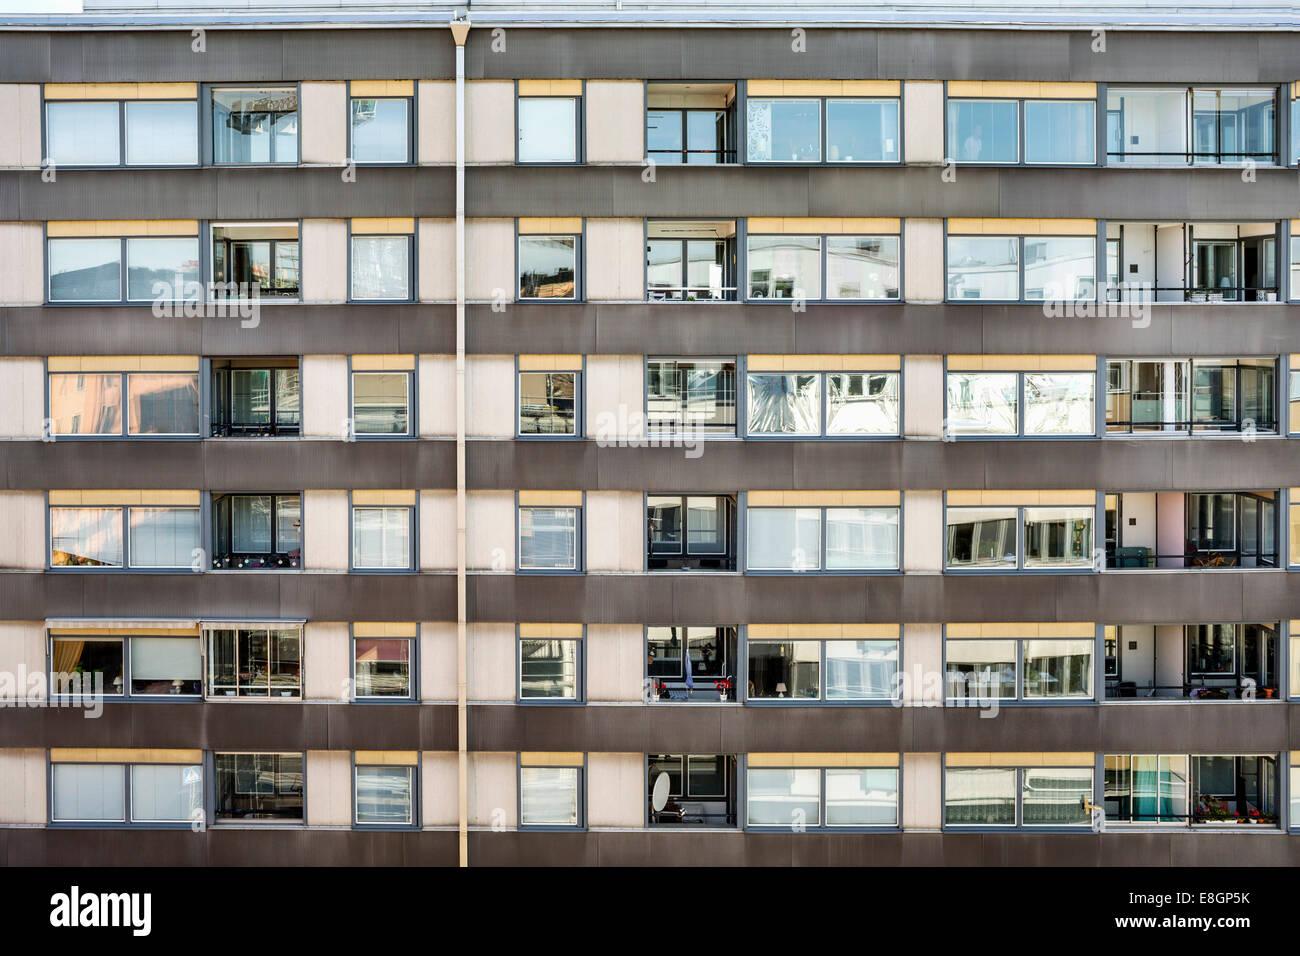 Full frame shot di edilizia residenziale Immagini Stock